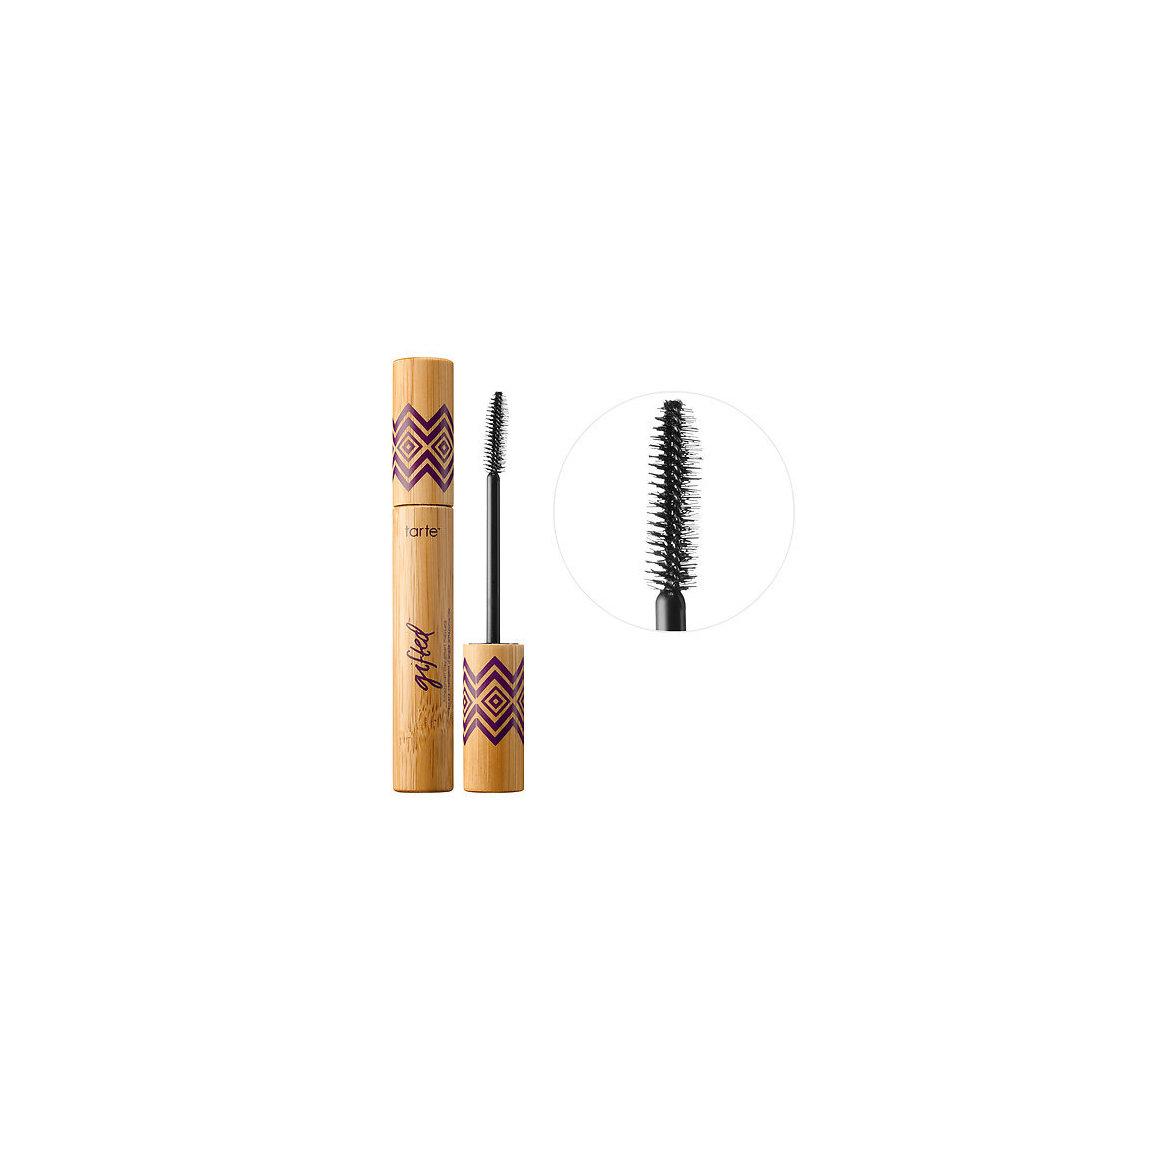 b7312454439 Tarte Gifted™ Amazonian Clay Smart Mascara | Beautylish